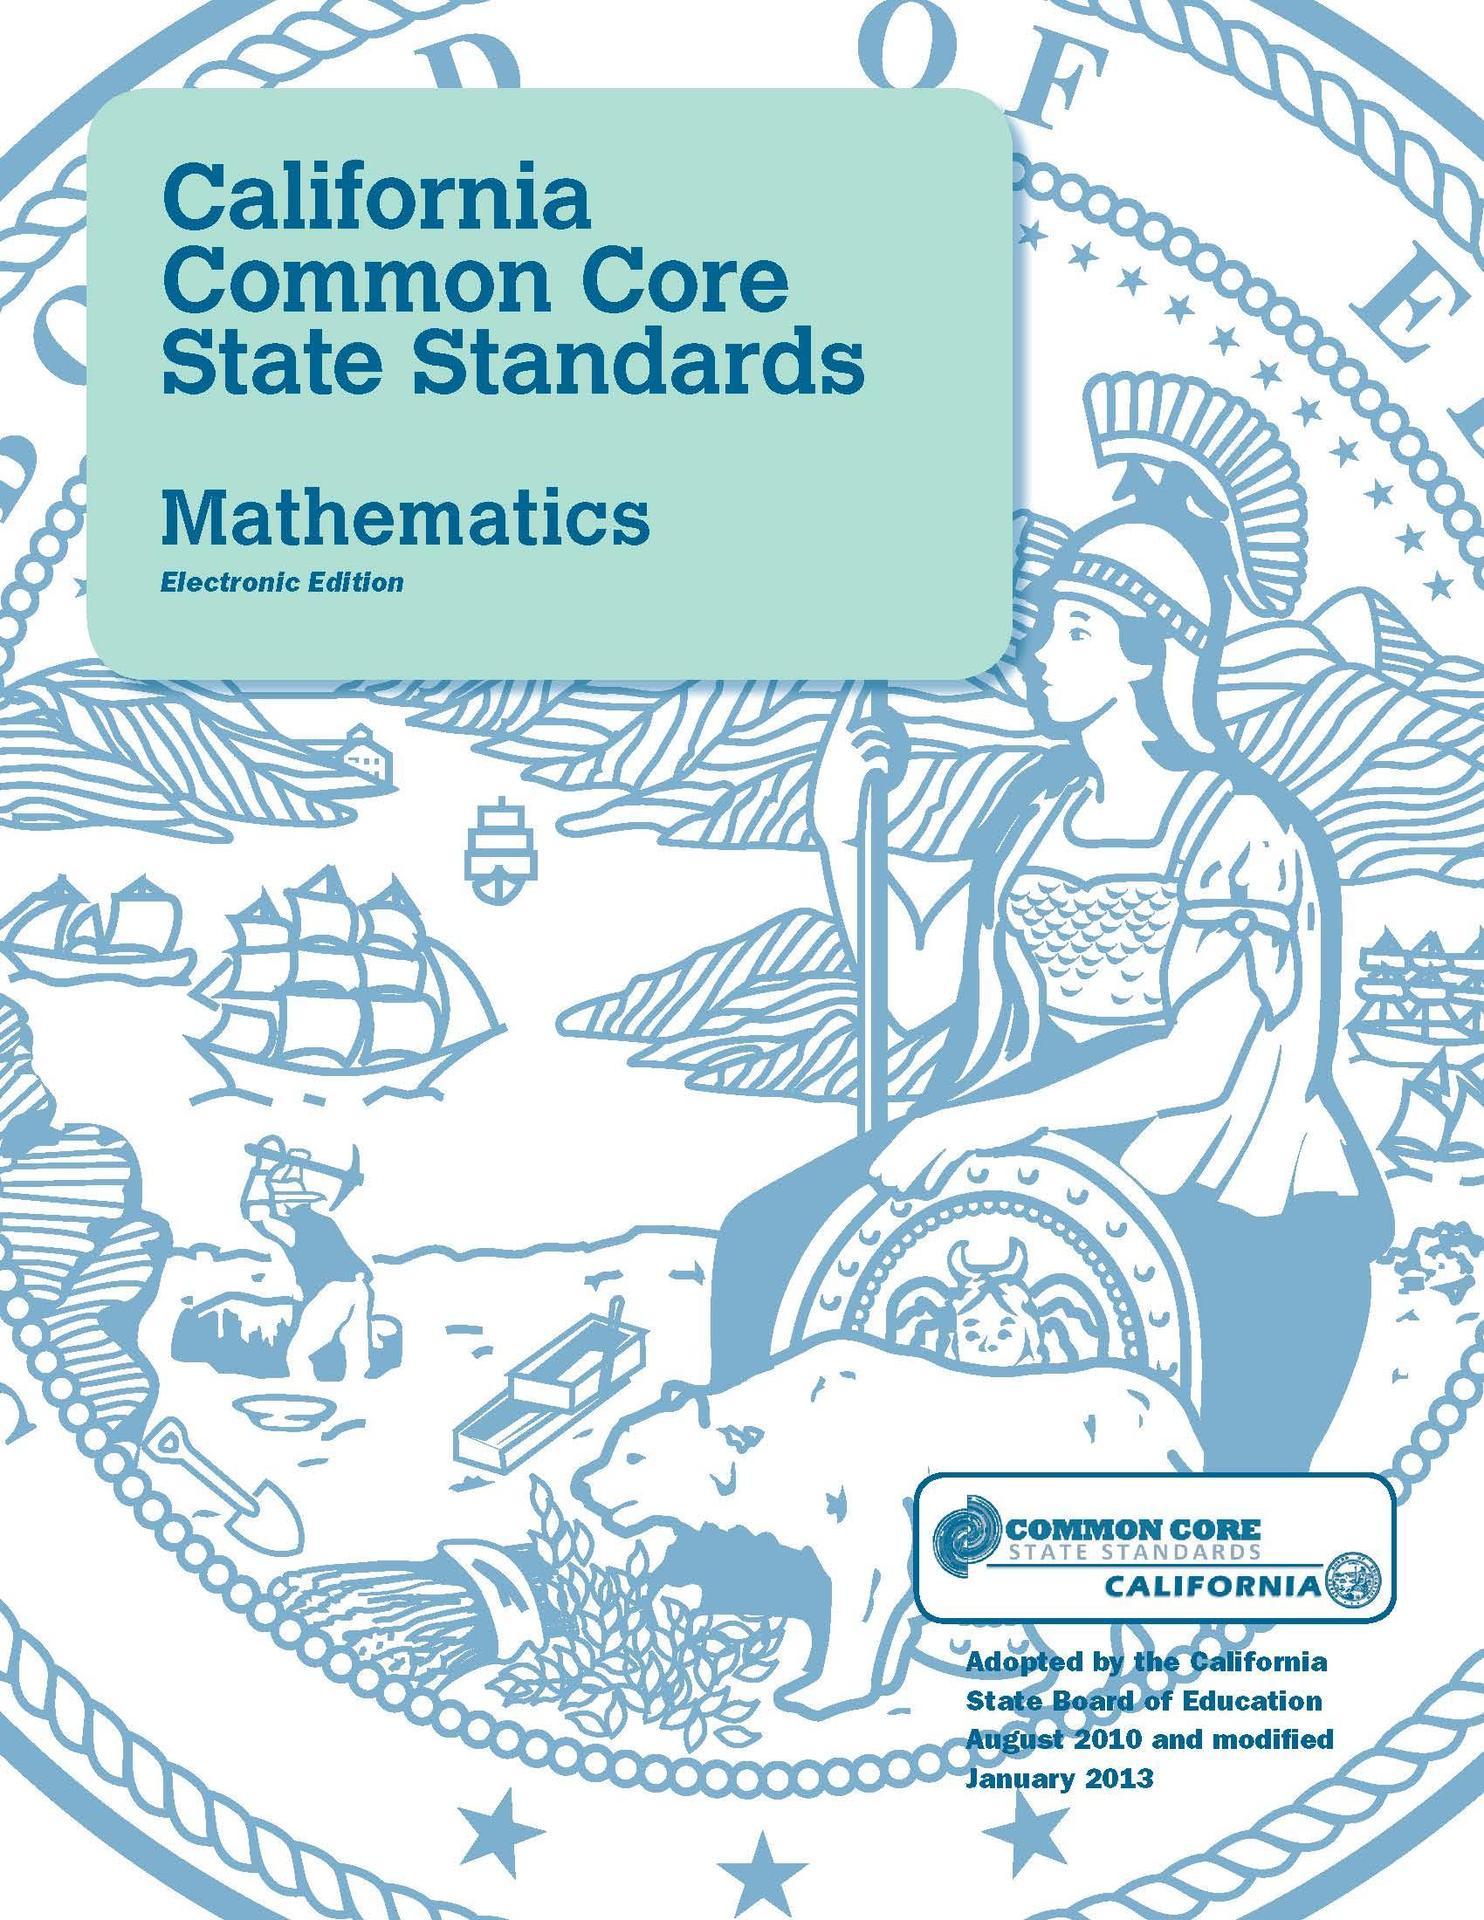 Common Core Math Standards Image